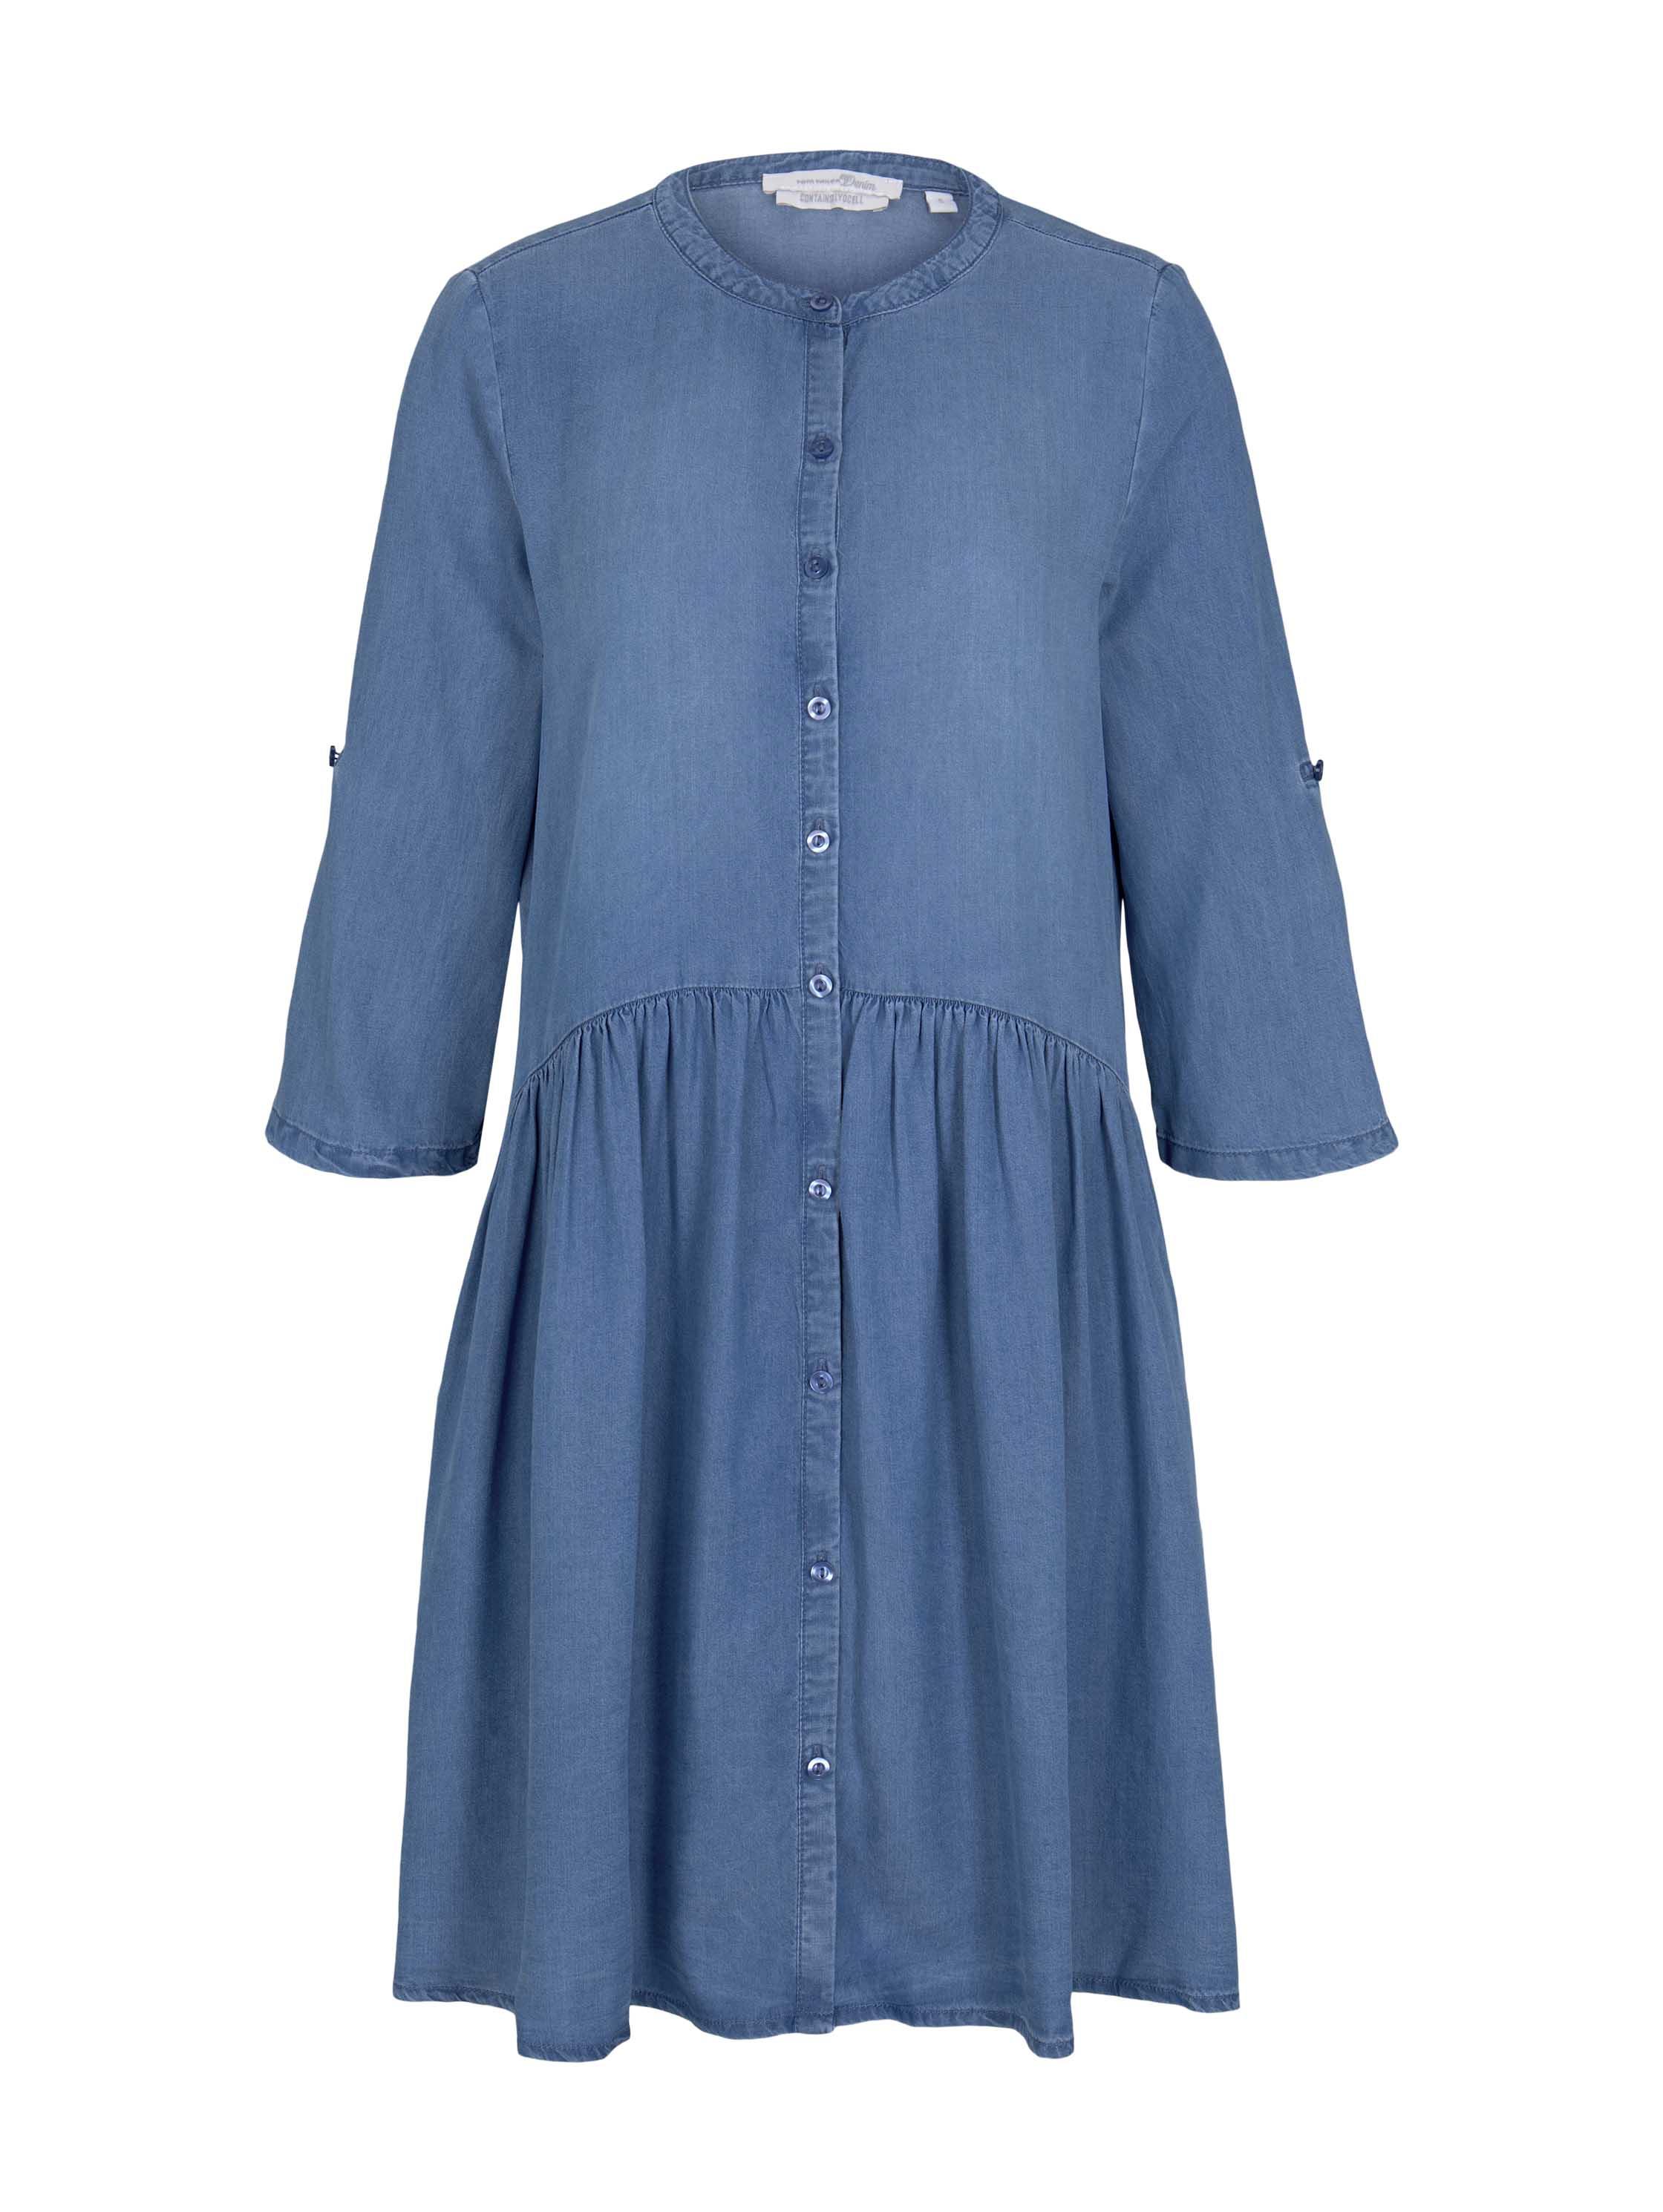 denim dress with placket, Blue Denim